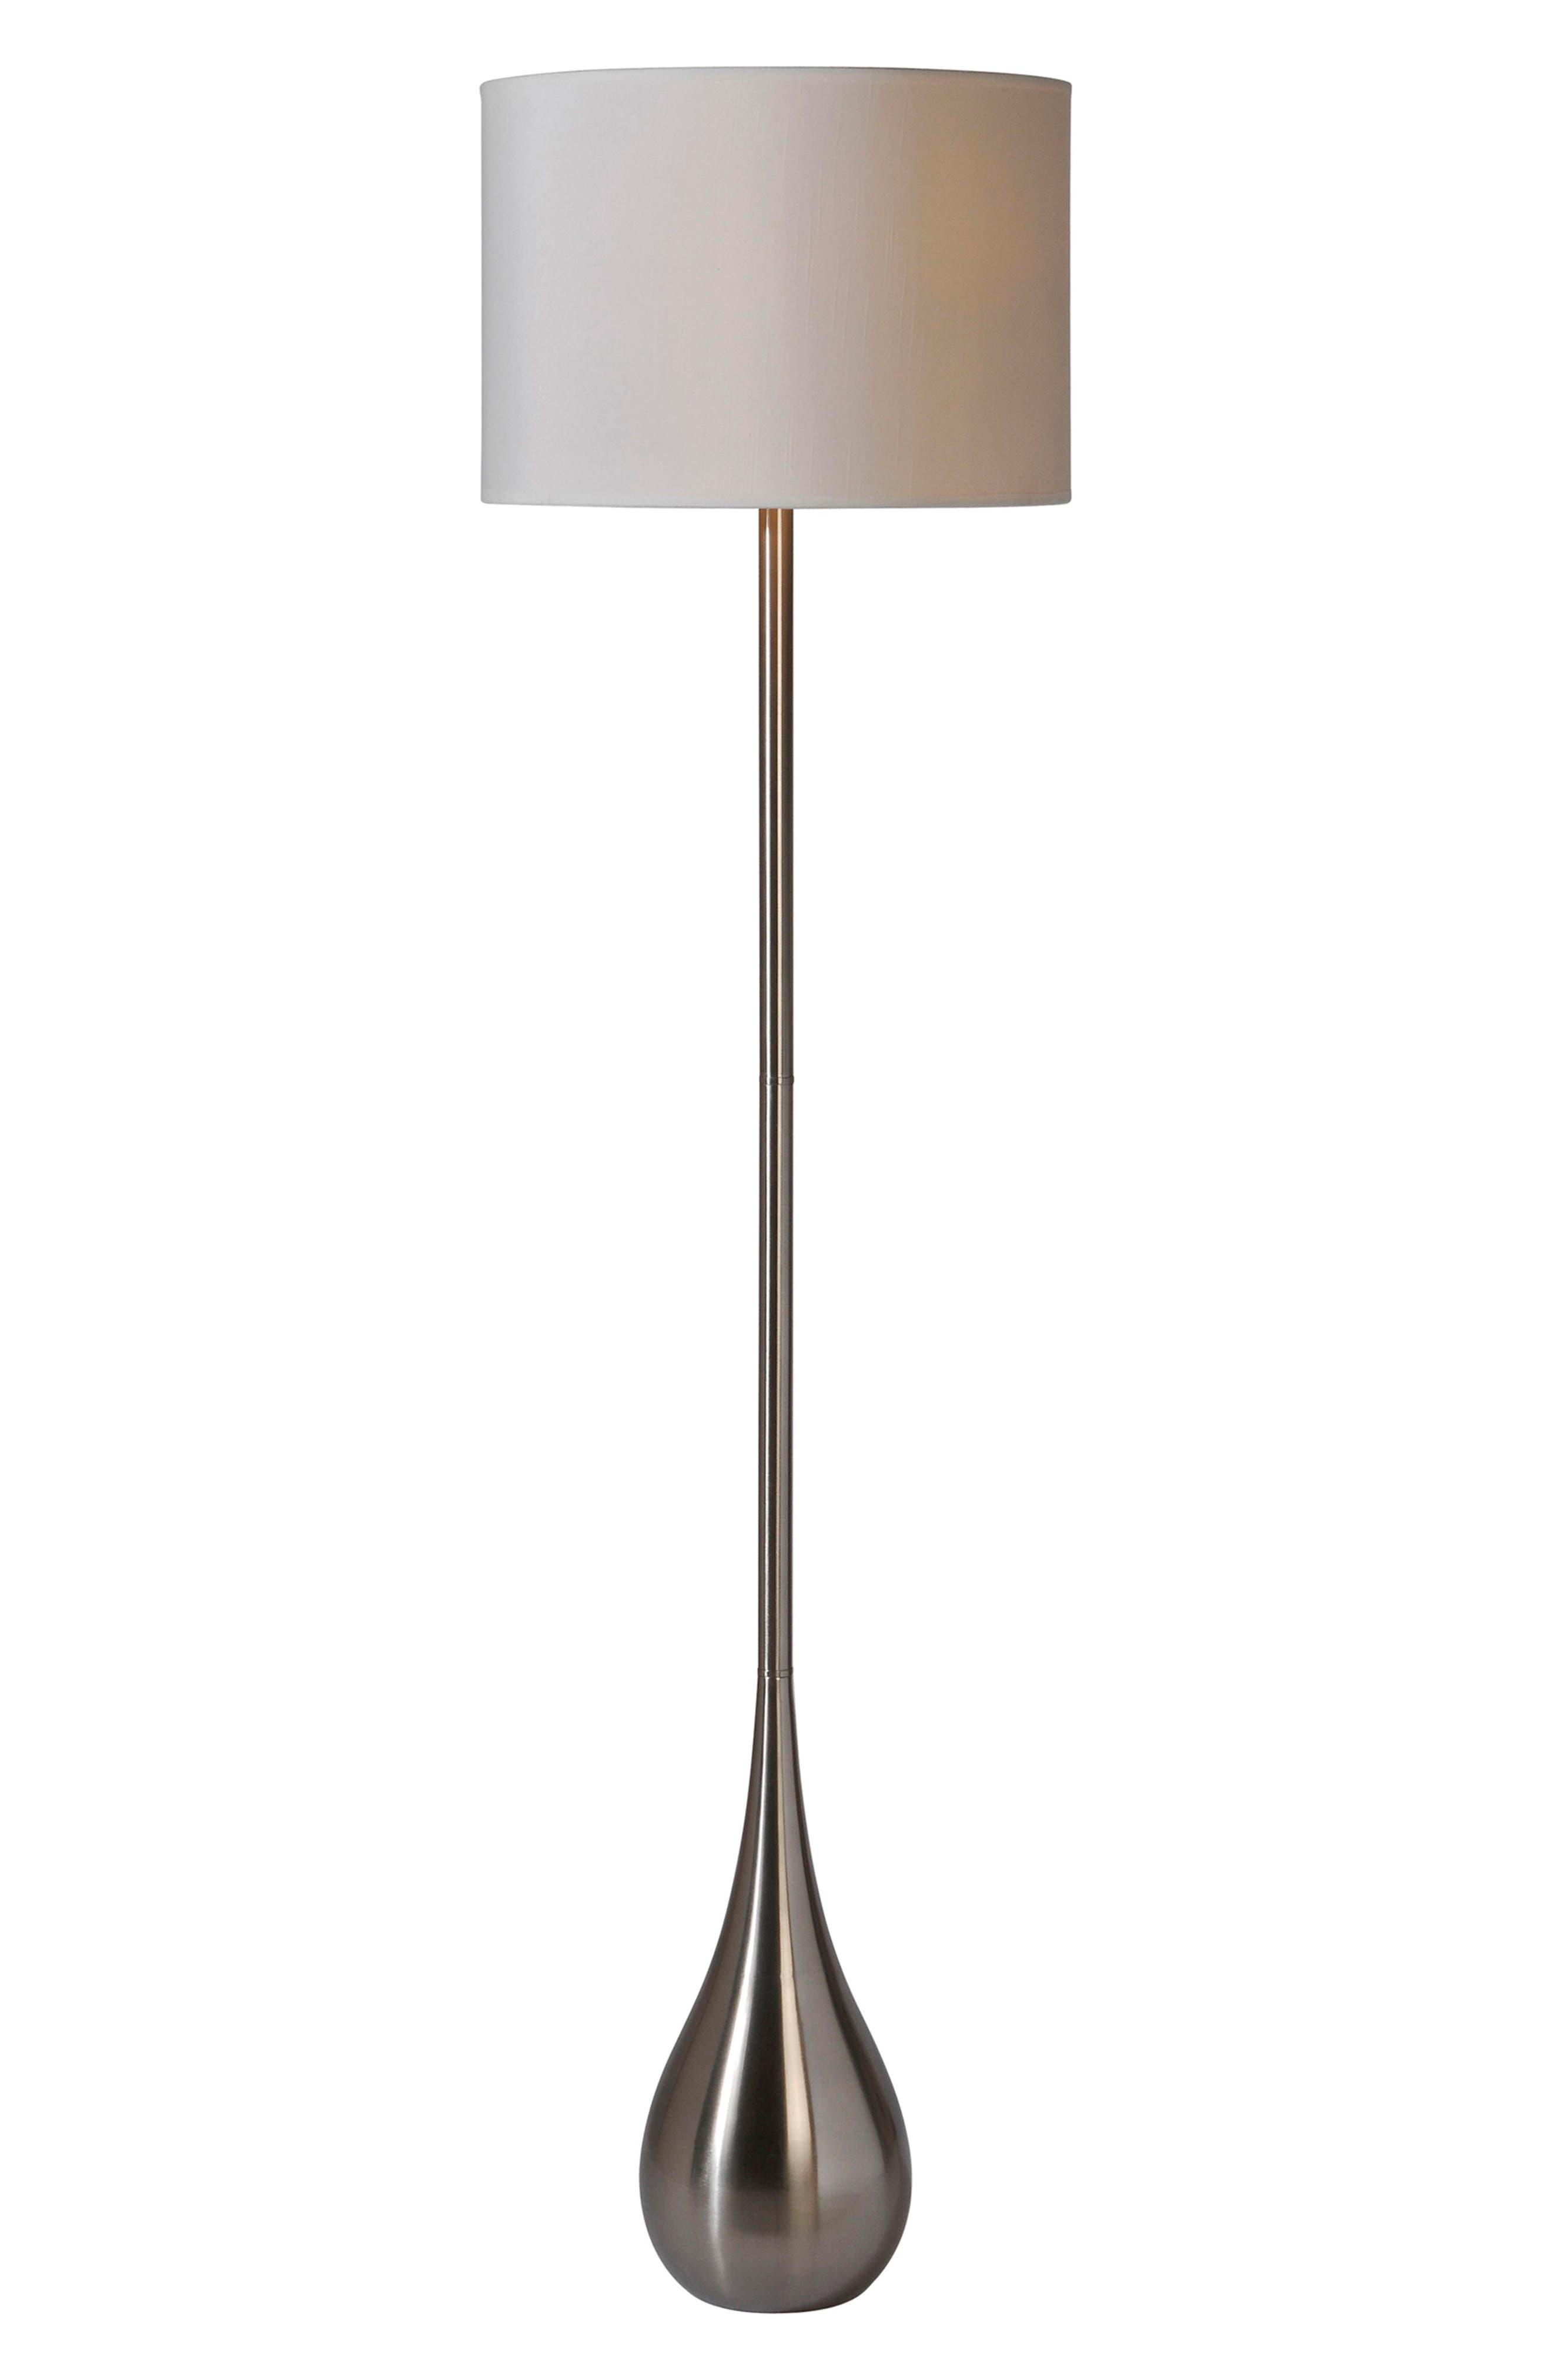 Satin Nickel Floor Lamp,                         Main,                         color, Satin Nickel